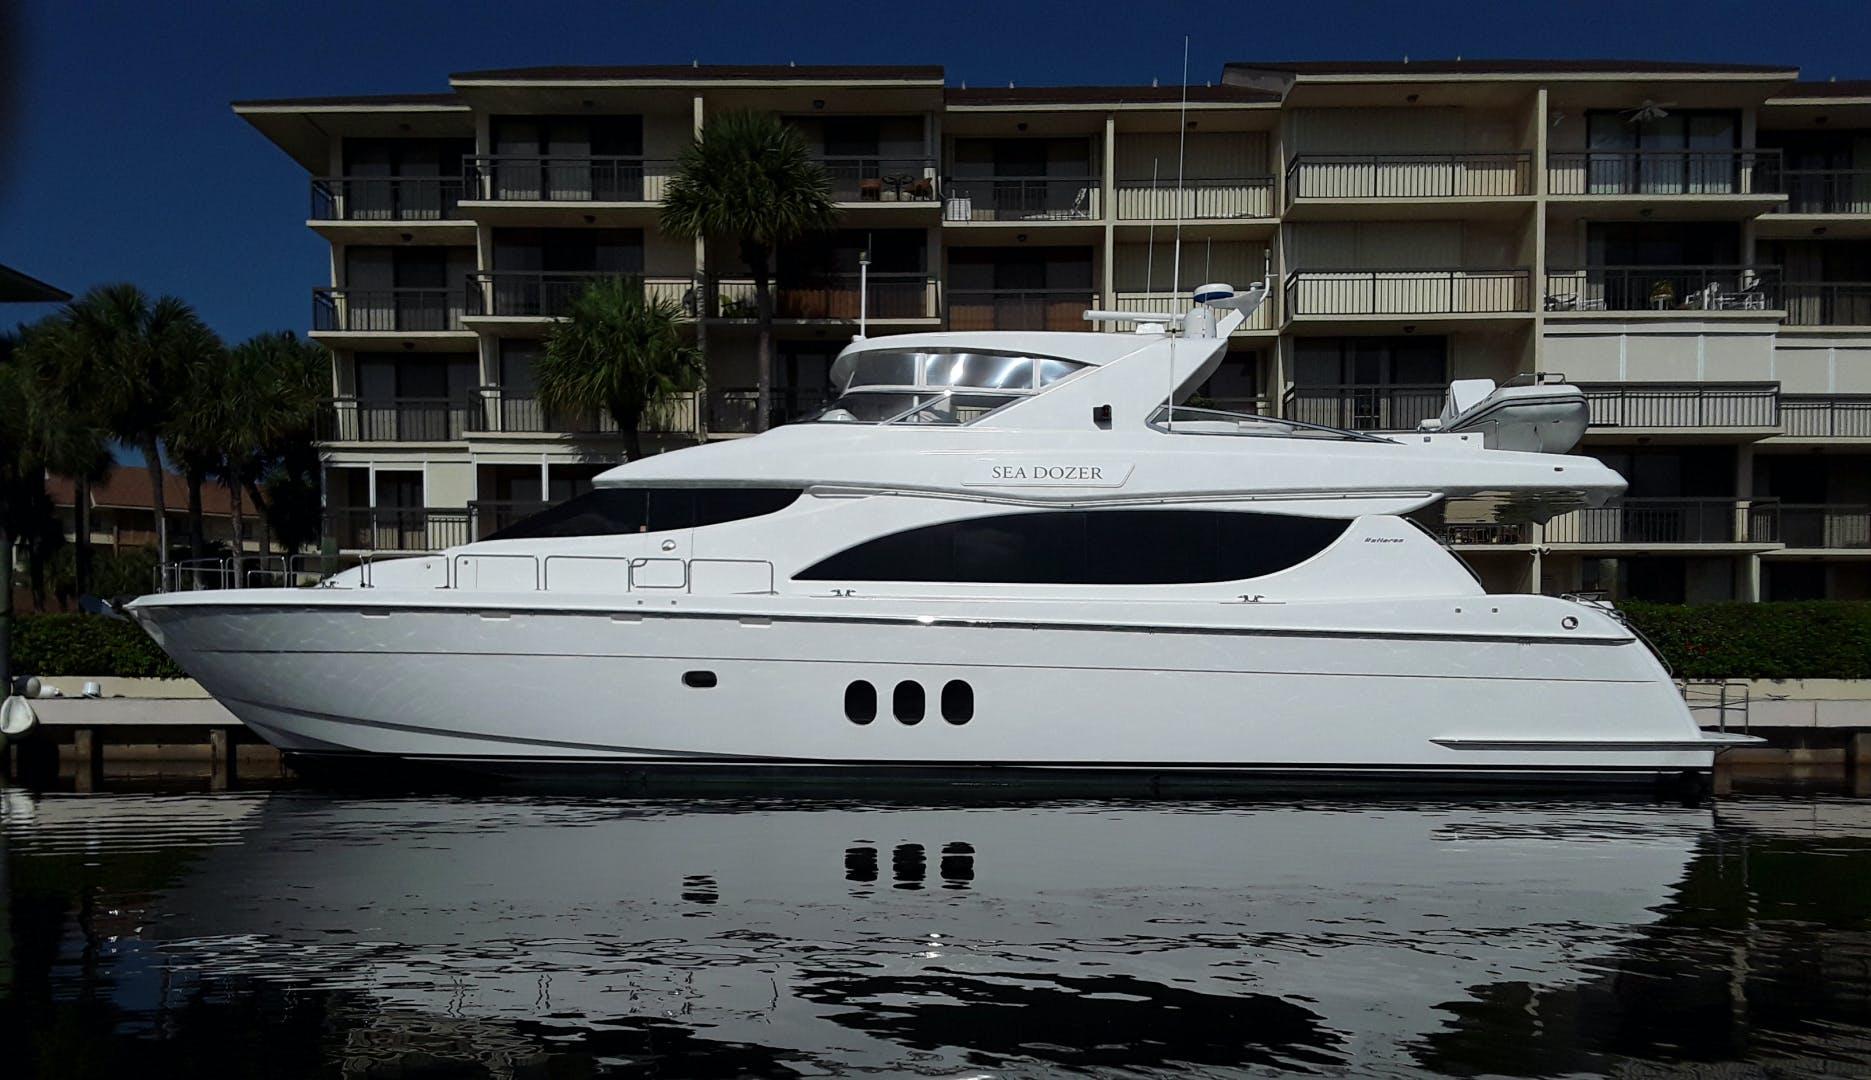 2004 Hatteras 80' Motor Yacht SEA DOZER | Picture 1 of 73